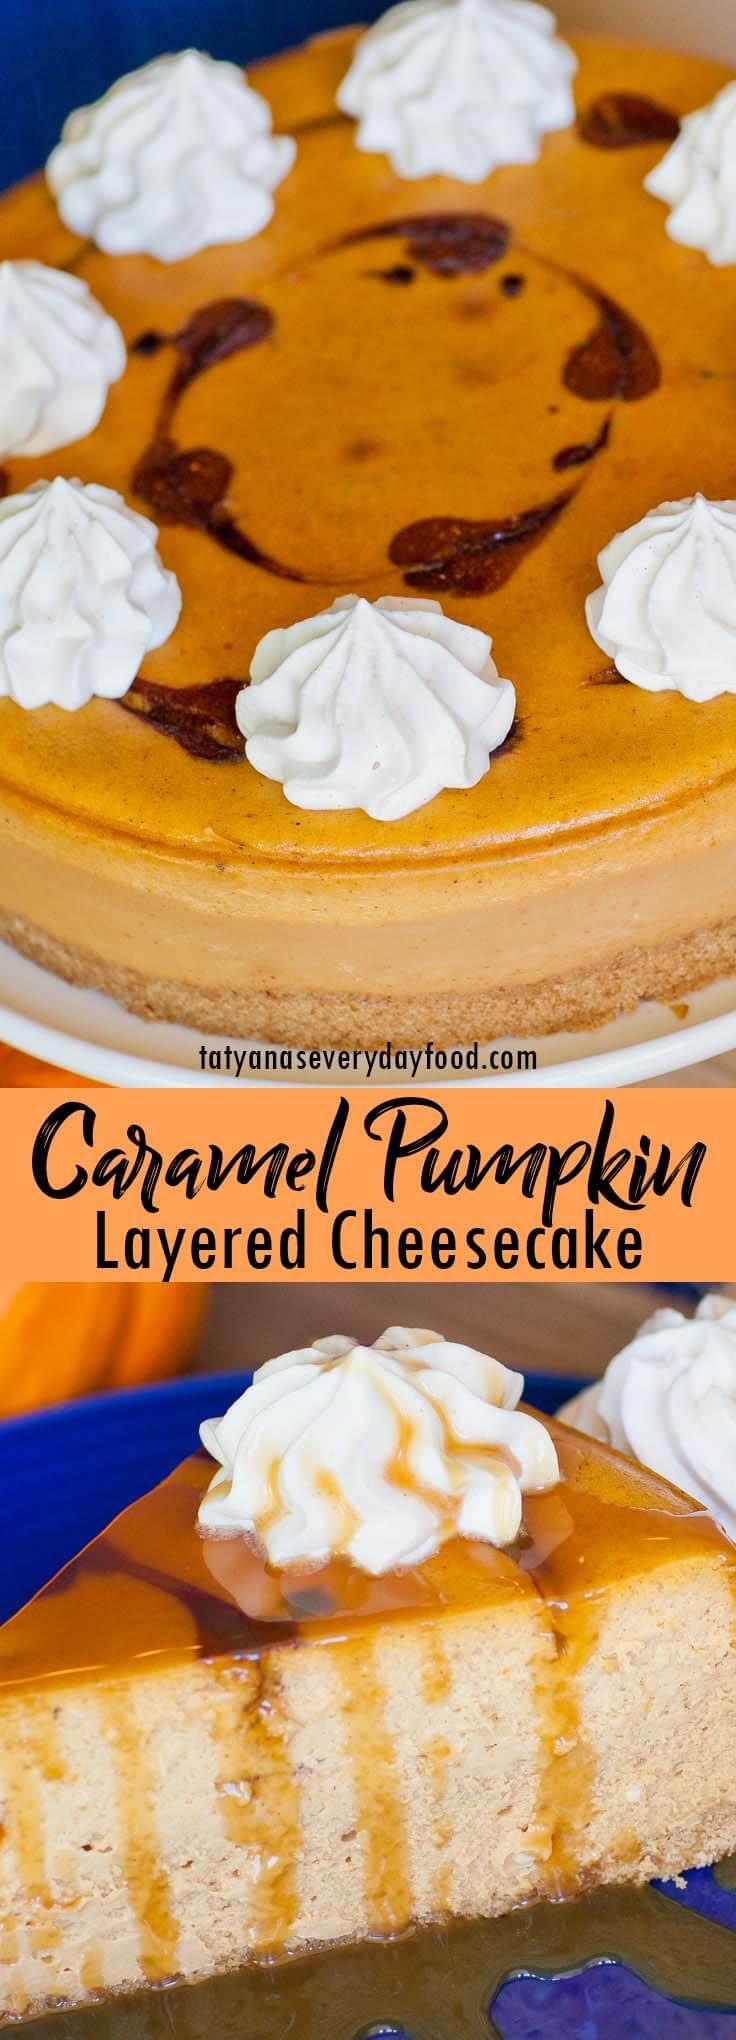 Caramel Pumpkin Cheesecake video recipe